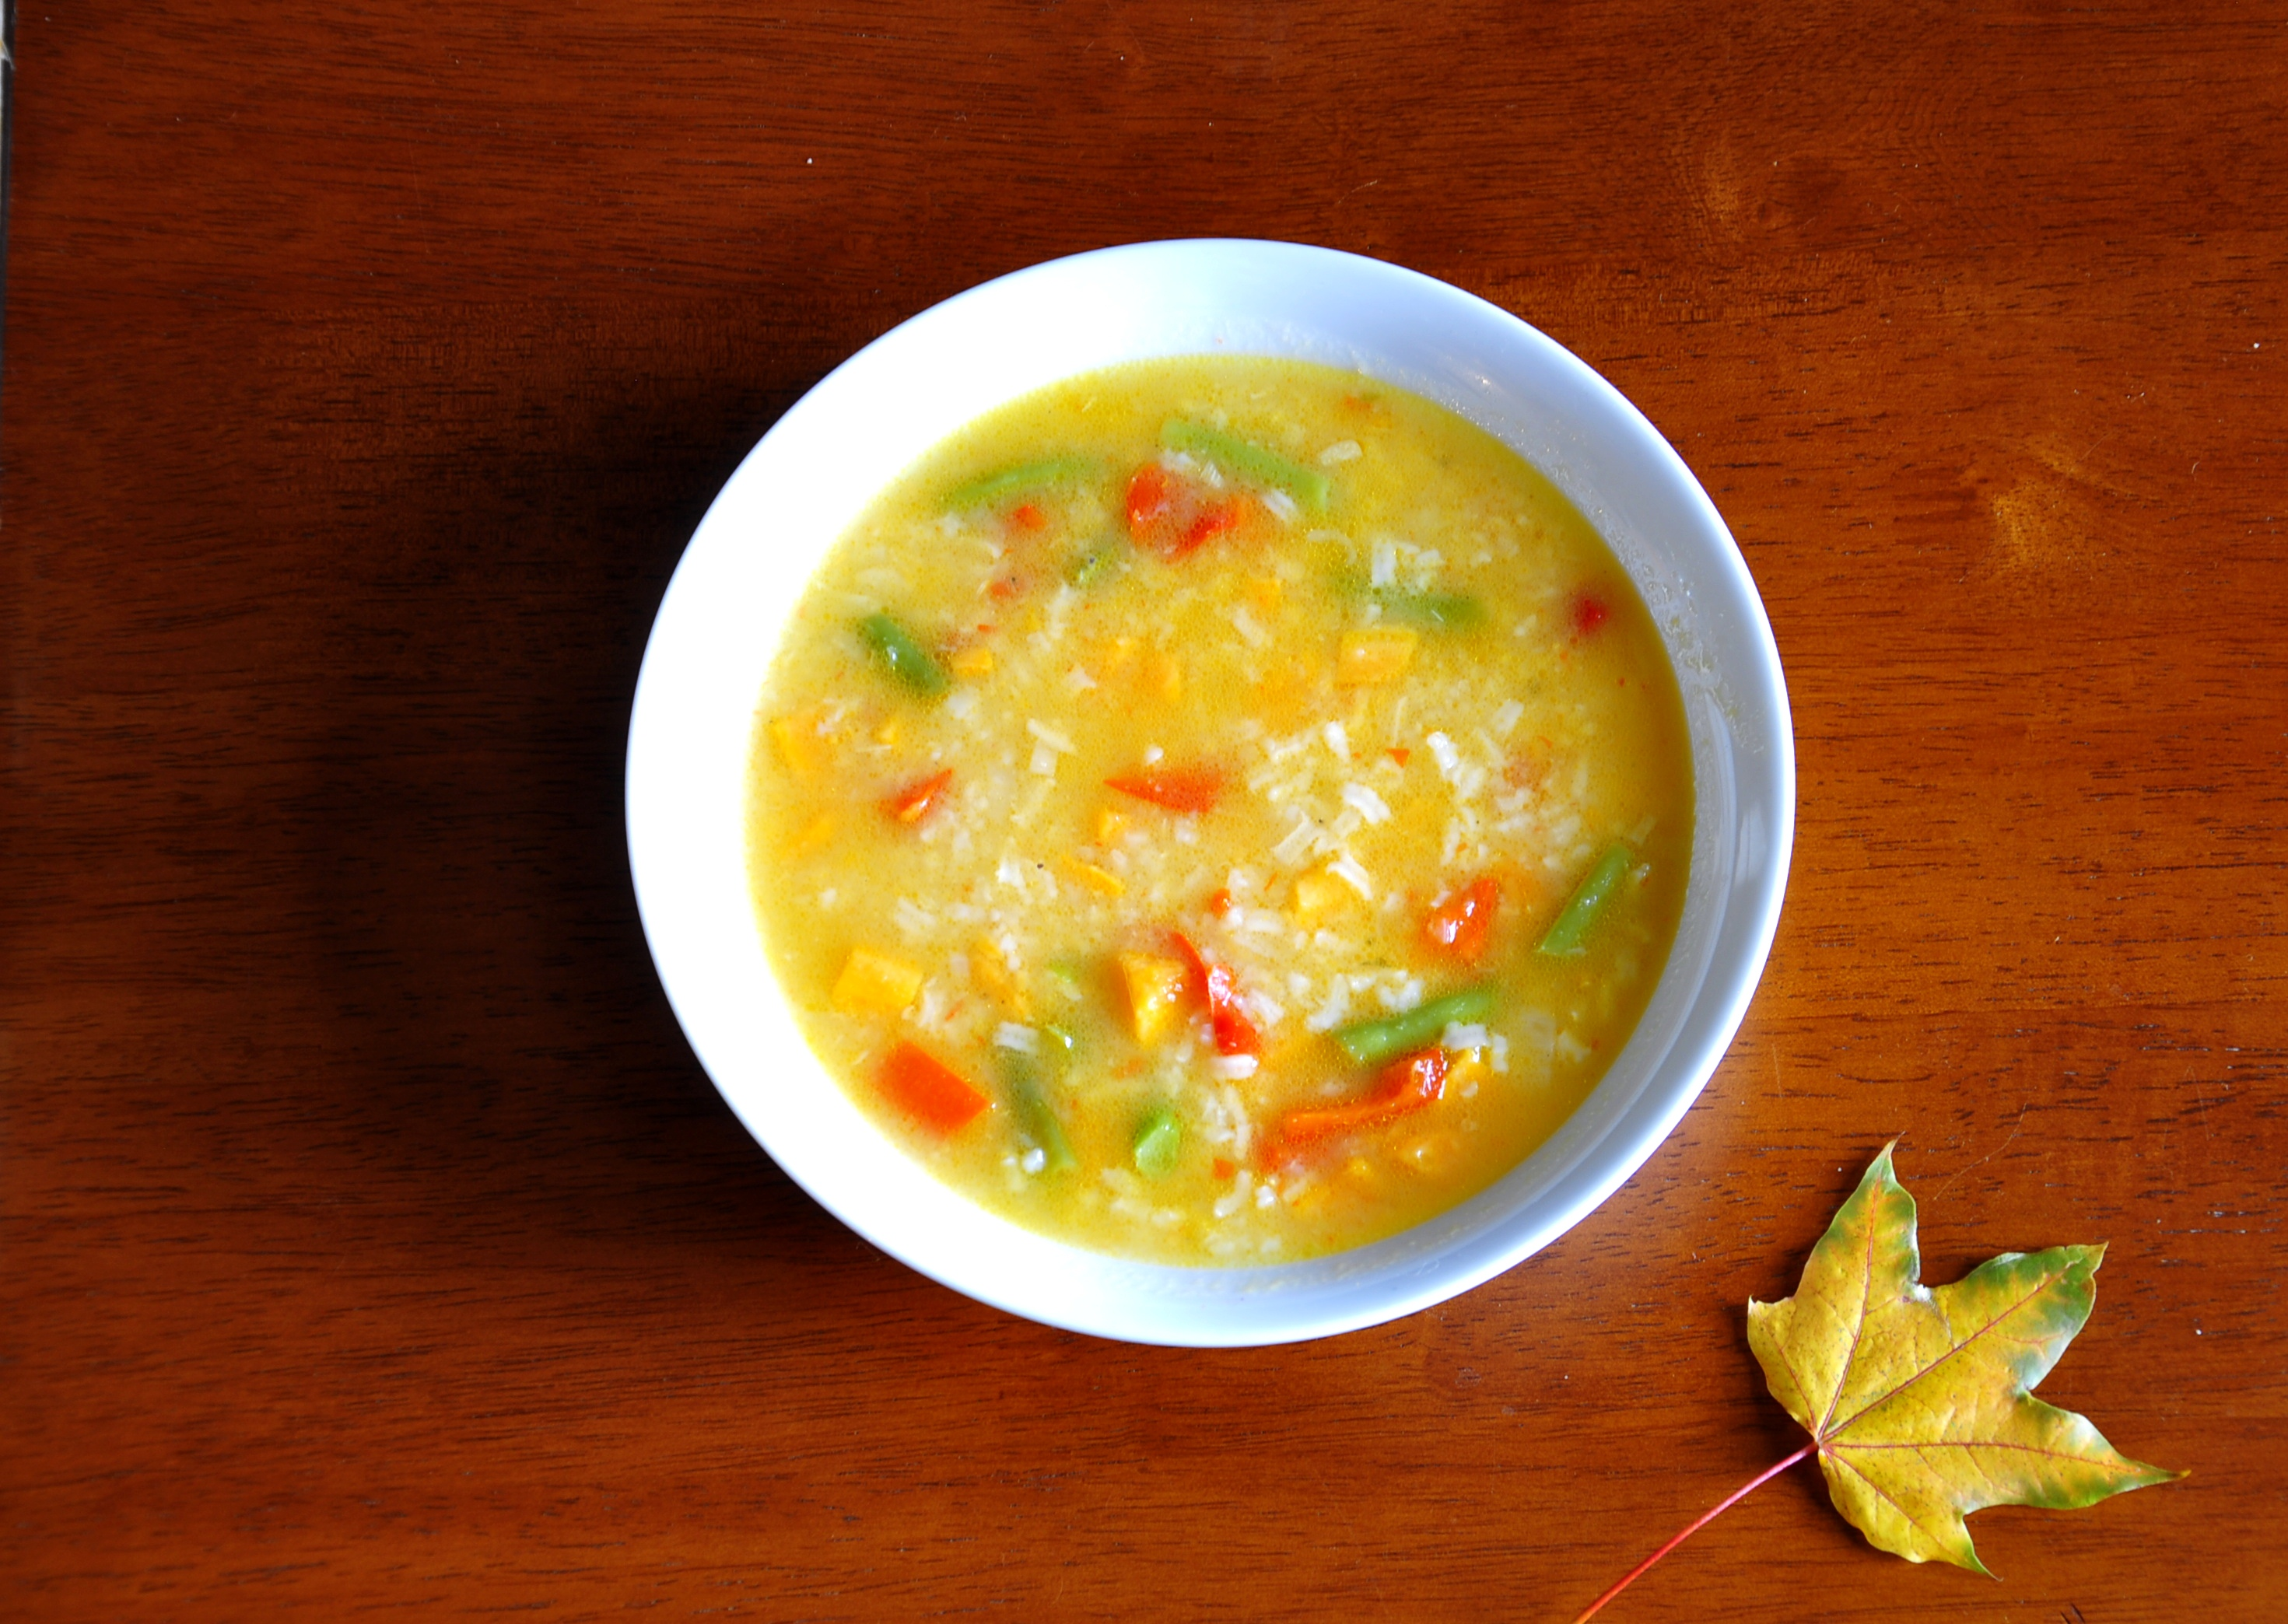 ... vegetable soup red lentil vegetable soup winter vegetable soup thick